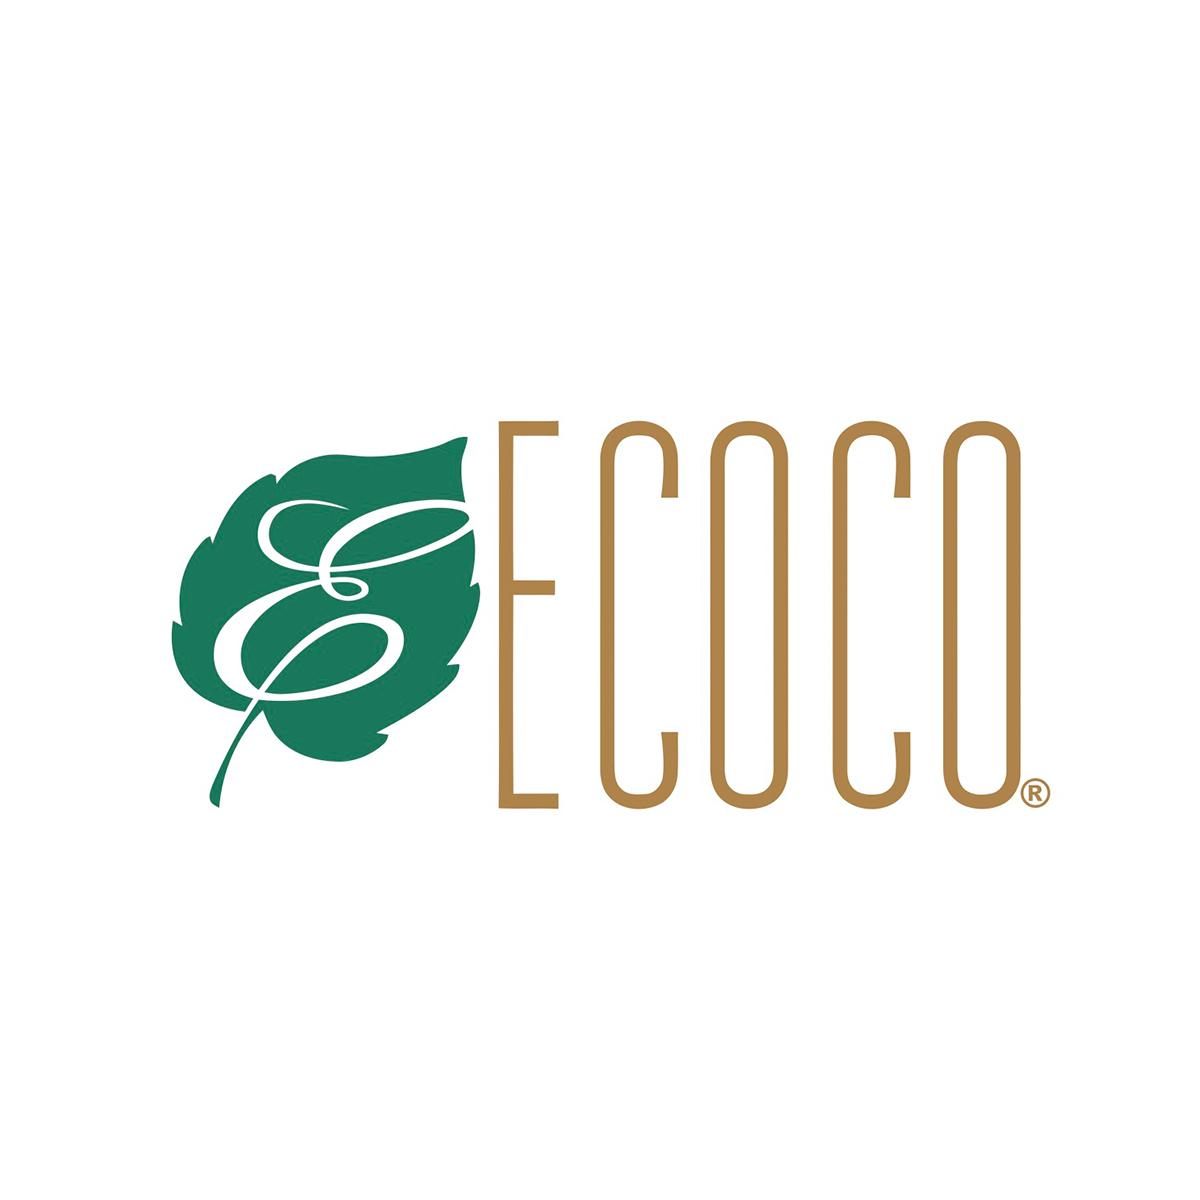 Ecoco.jpg